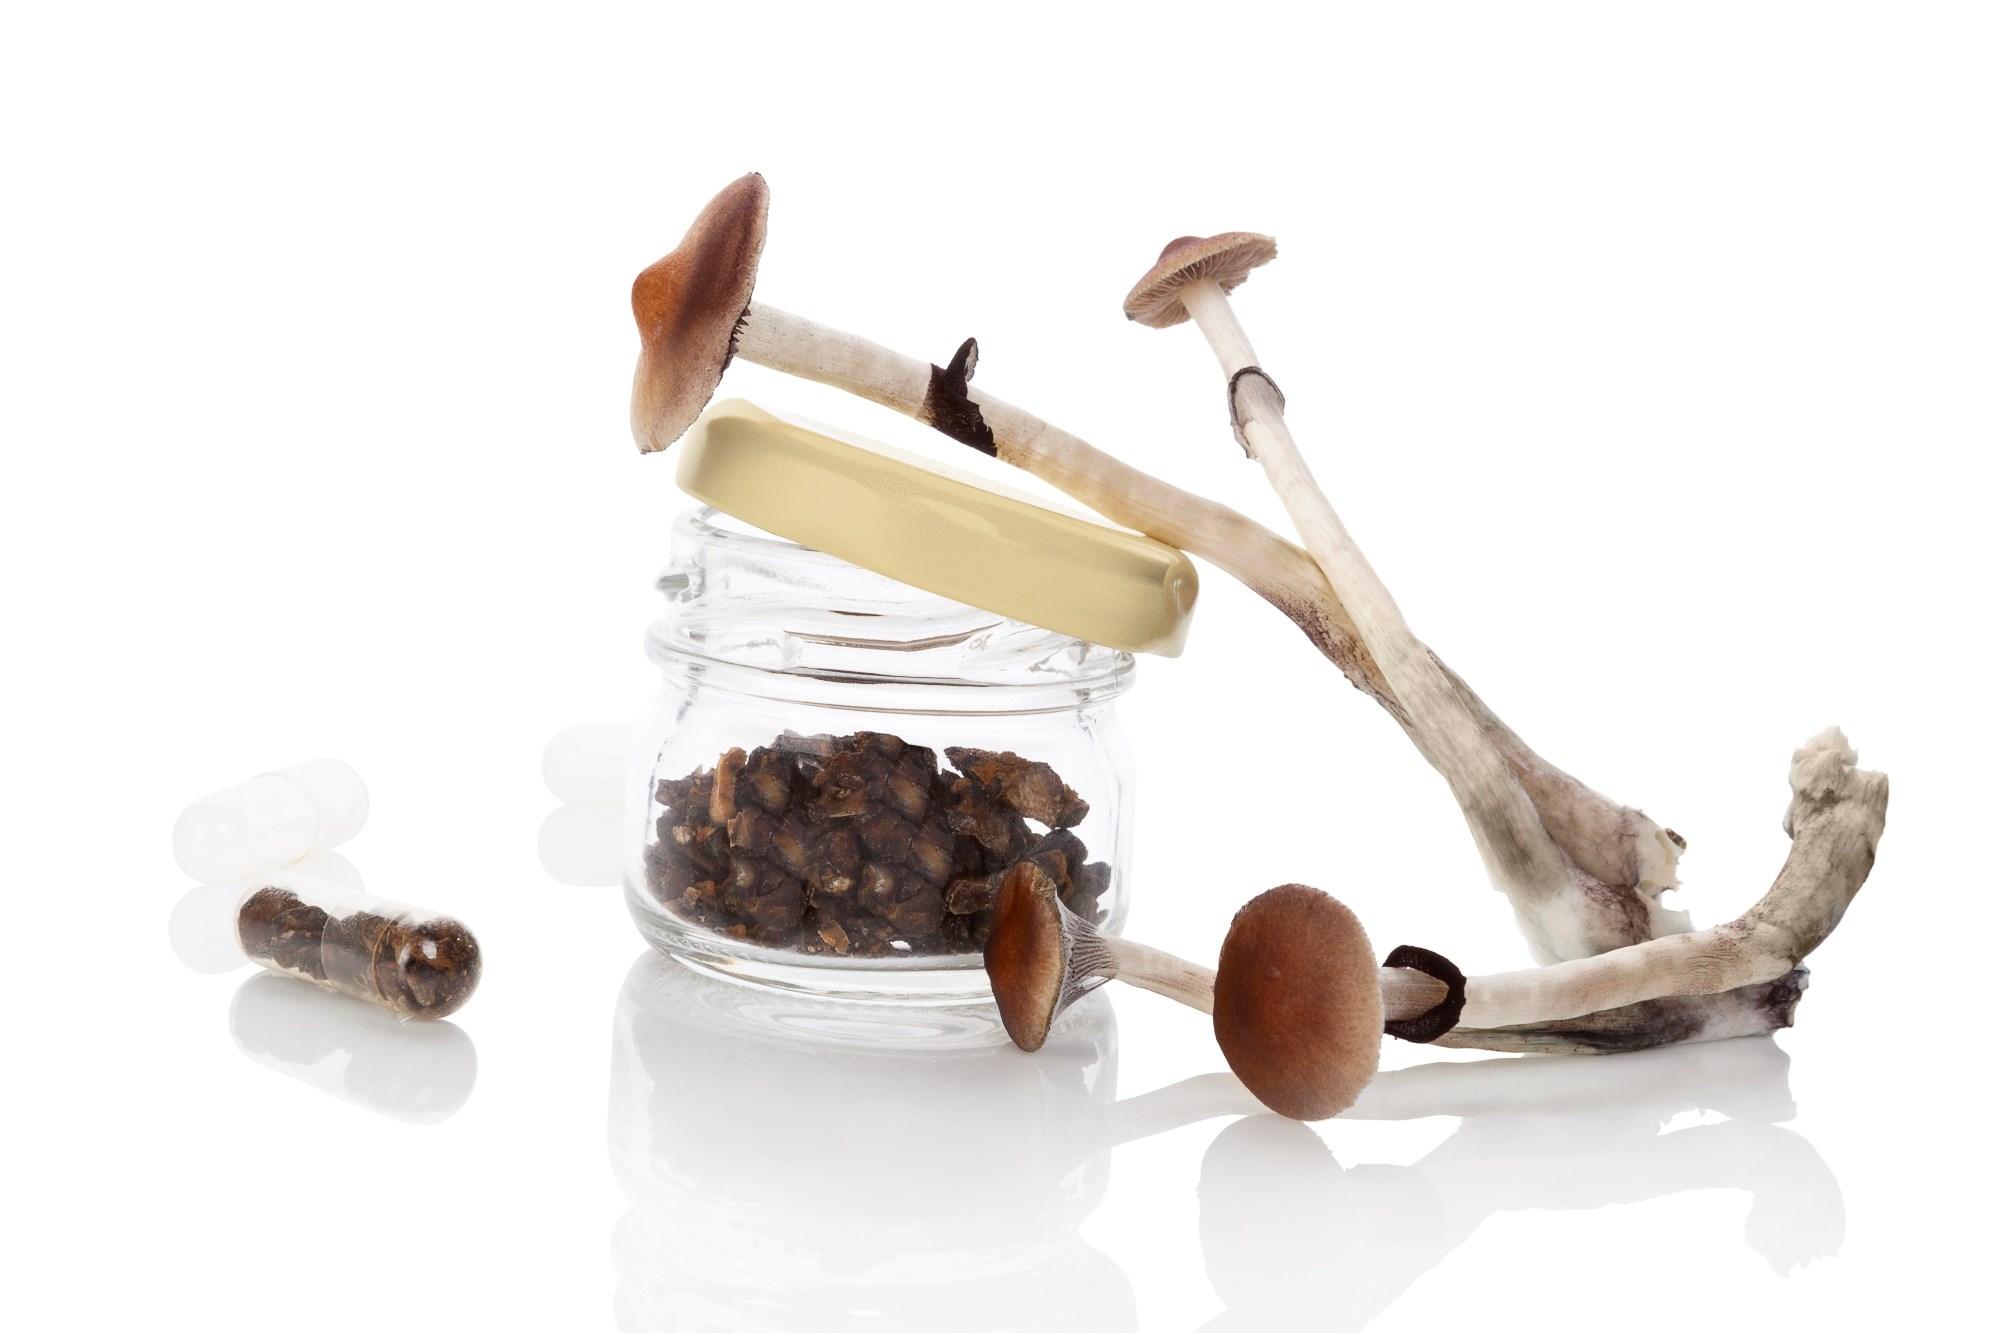 Psilocybin, a serotonin receptor agonist, is a component of some mushroom species.